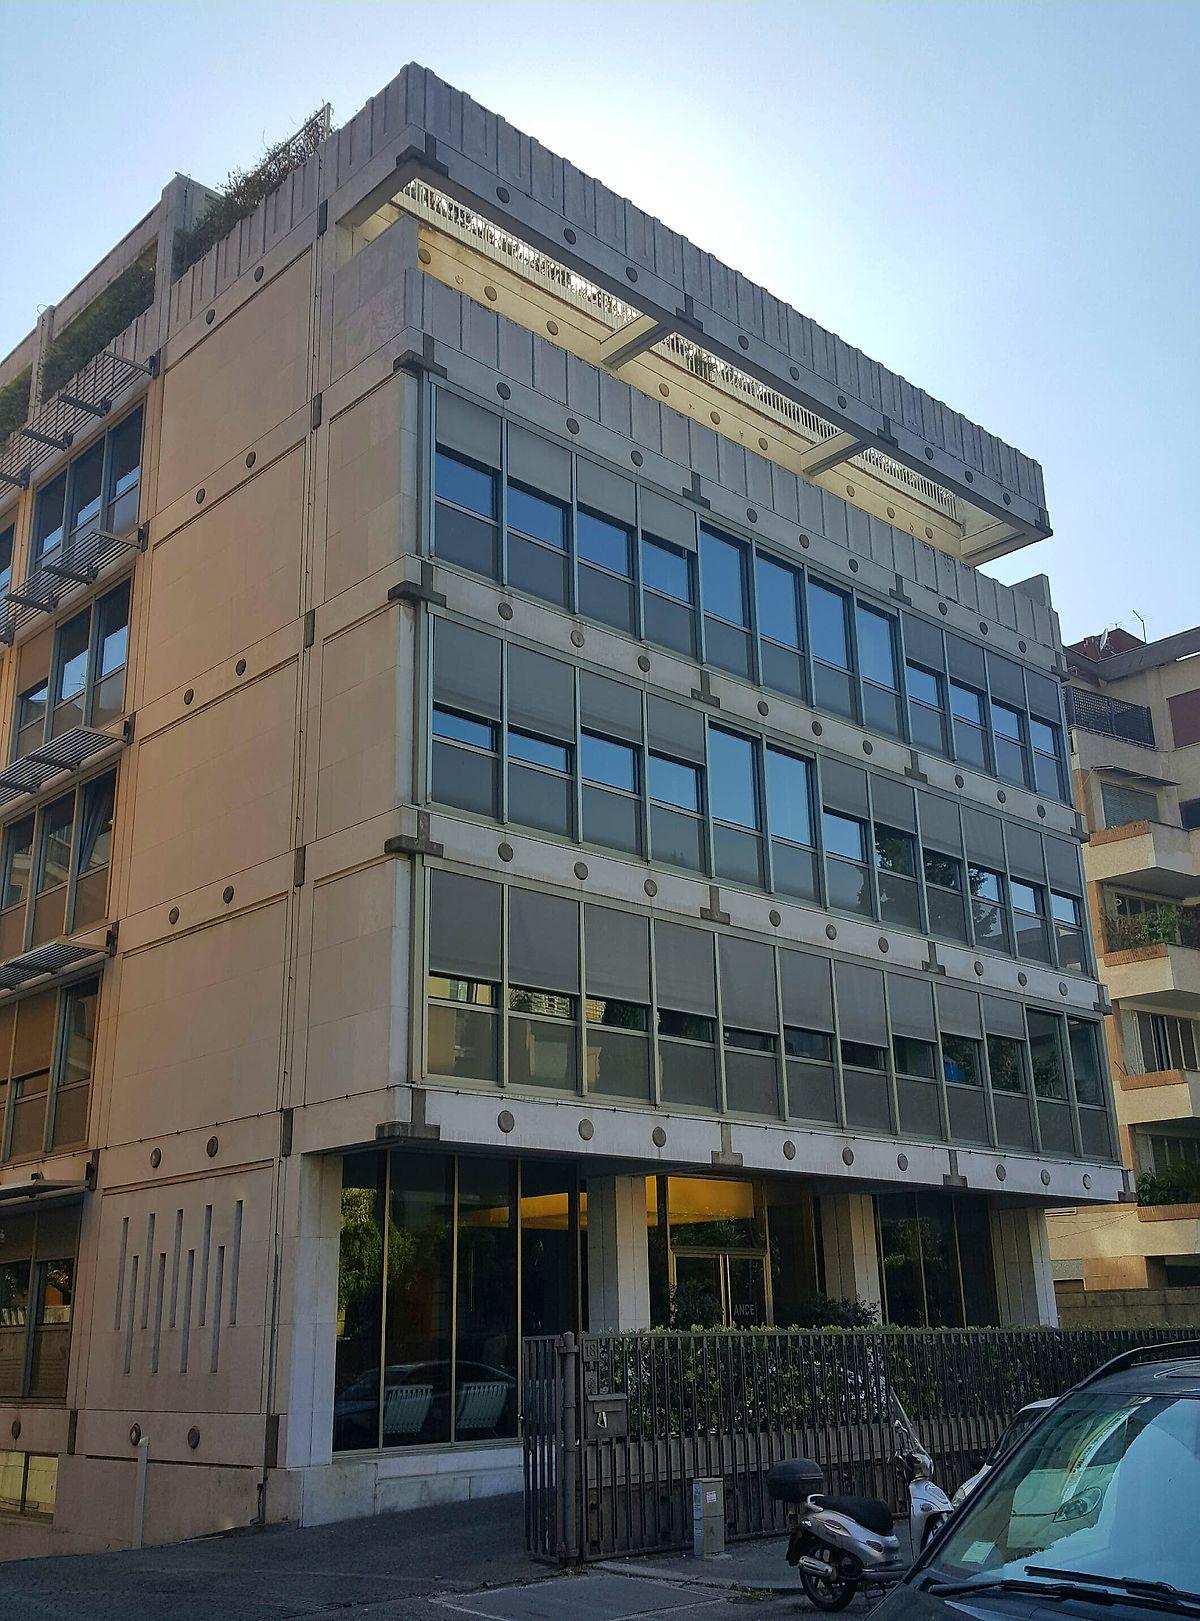 Imprese Di Costruzioni Roma associazione nazionale costruttori edili - wikipedia